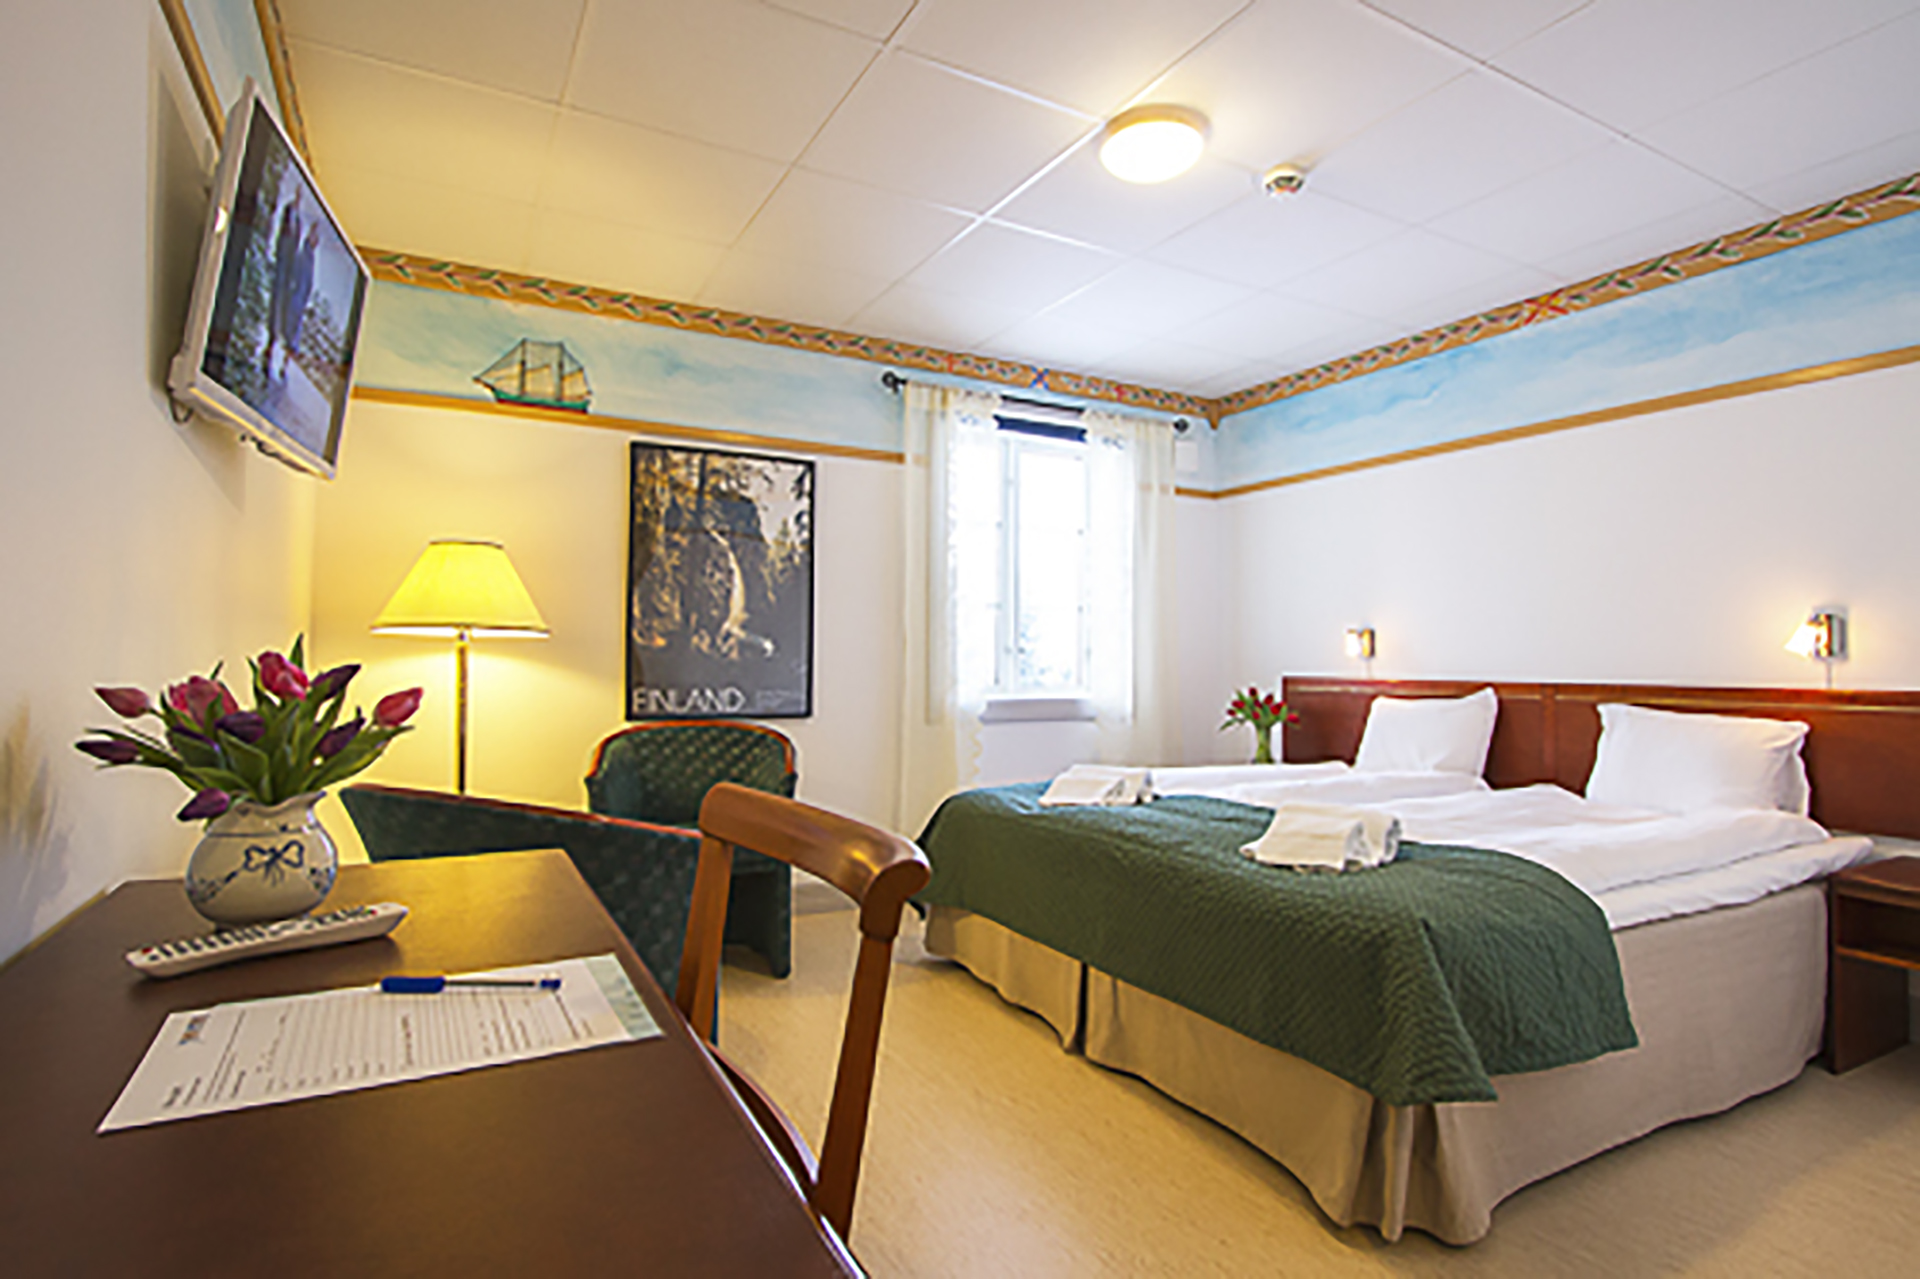 Hotell-Mannaminne-Hotell-Sestola